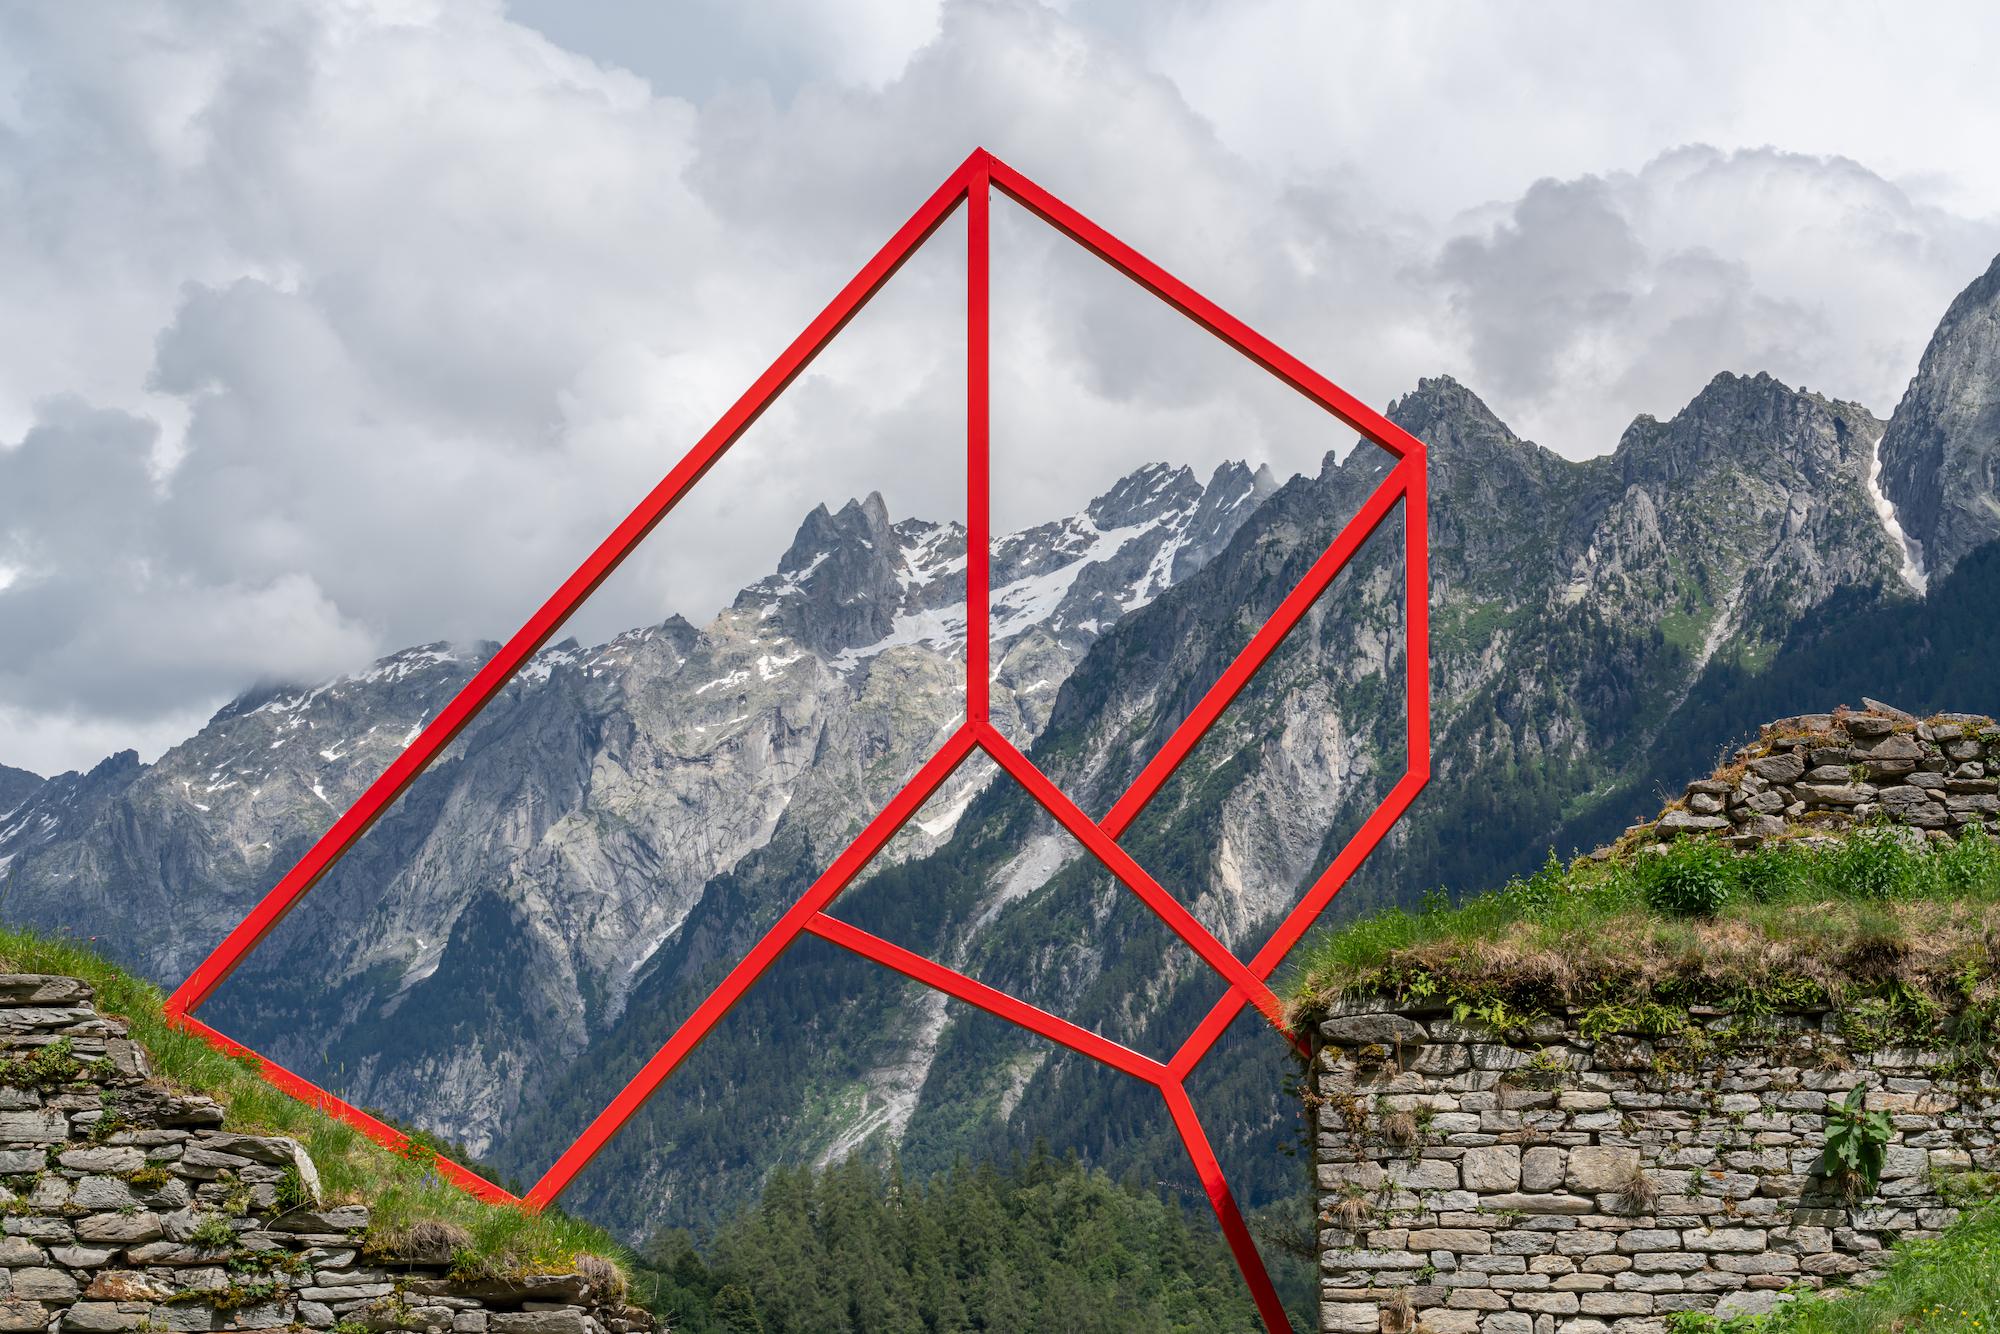 Biennale Bregaglia 2020 – Alex Dorici, Arco geometrico, 2020; Bild © Yanik Bürkli, CLUS AG